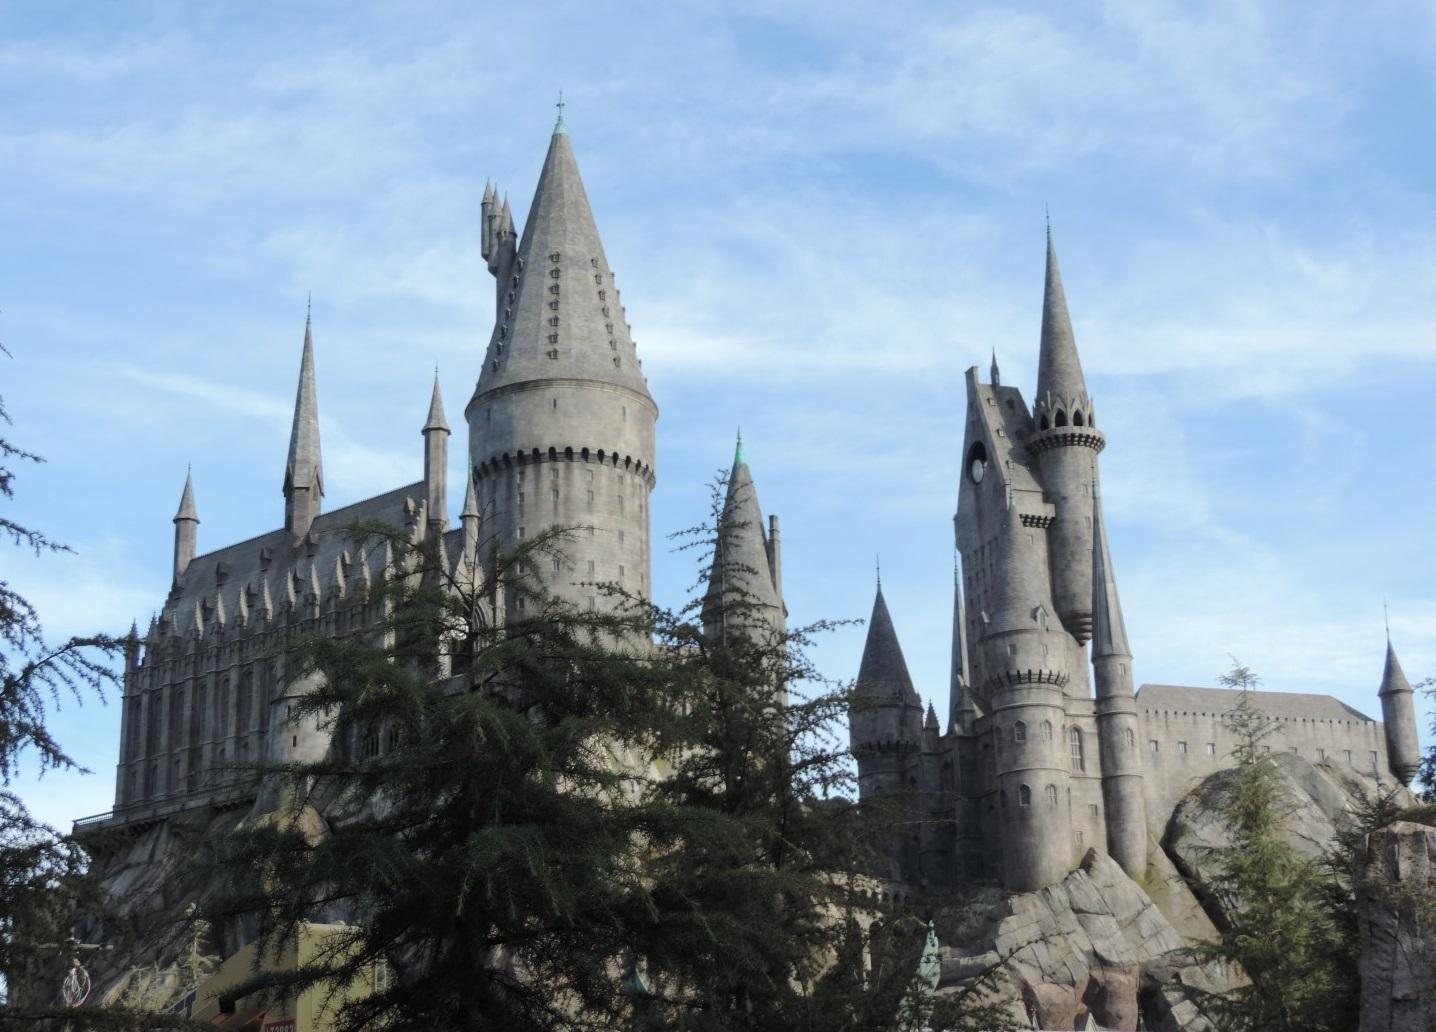 Wizarding World in California